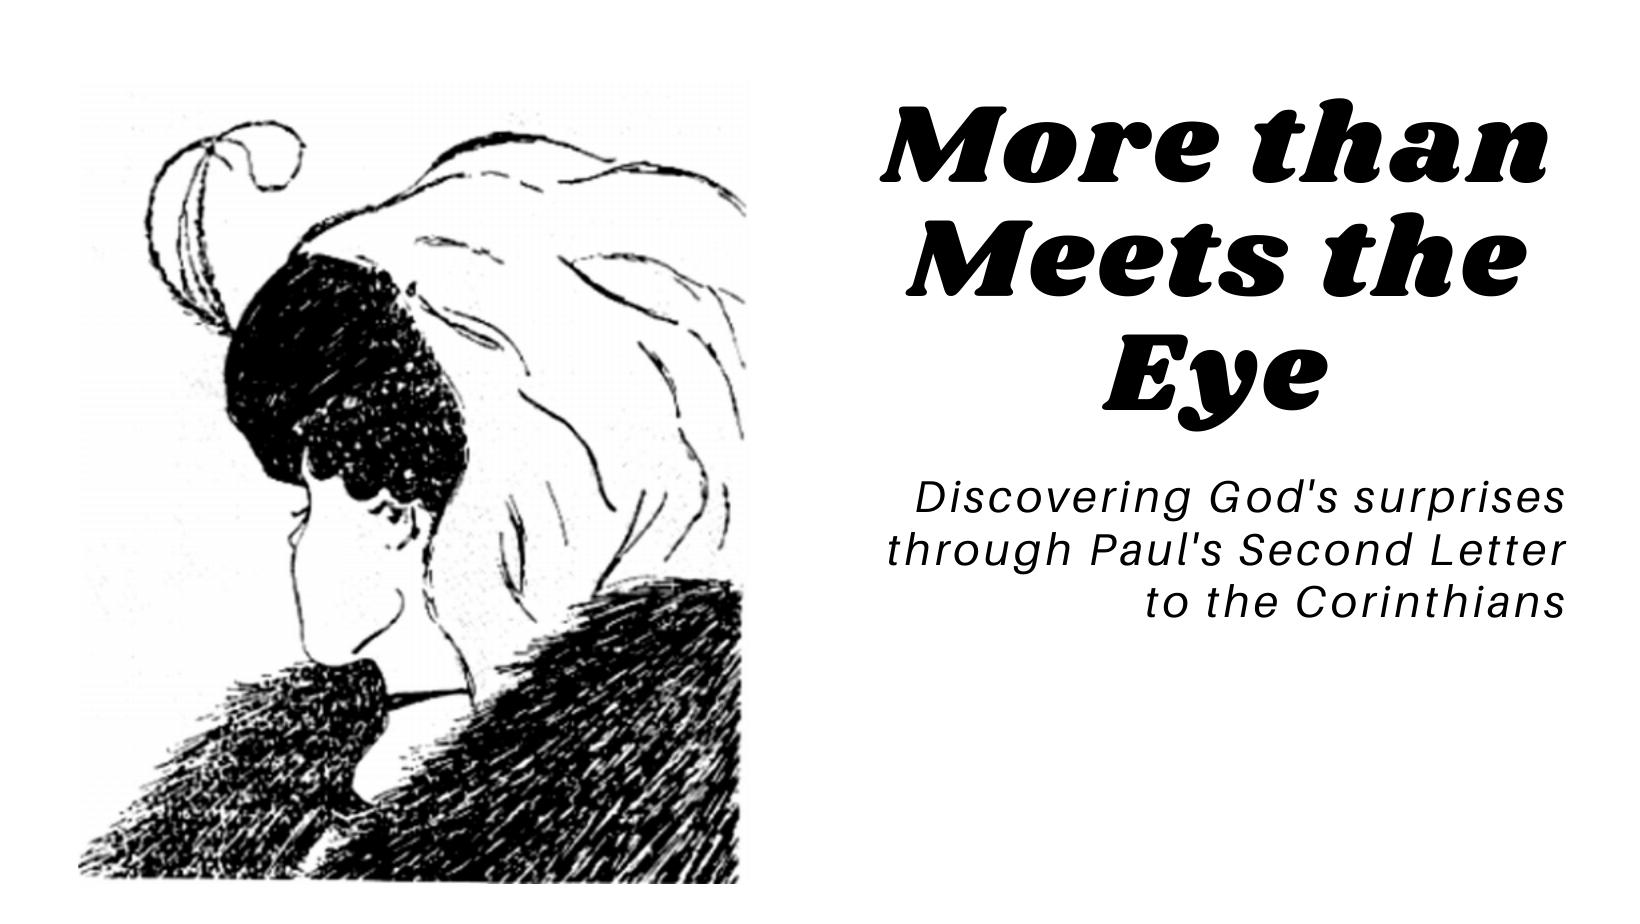 More Than Meets the Eye: May 30-June 27 Worship Series